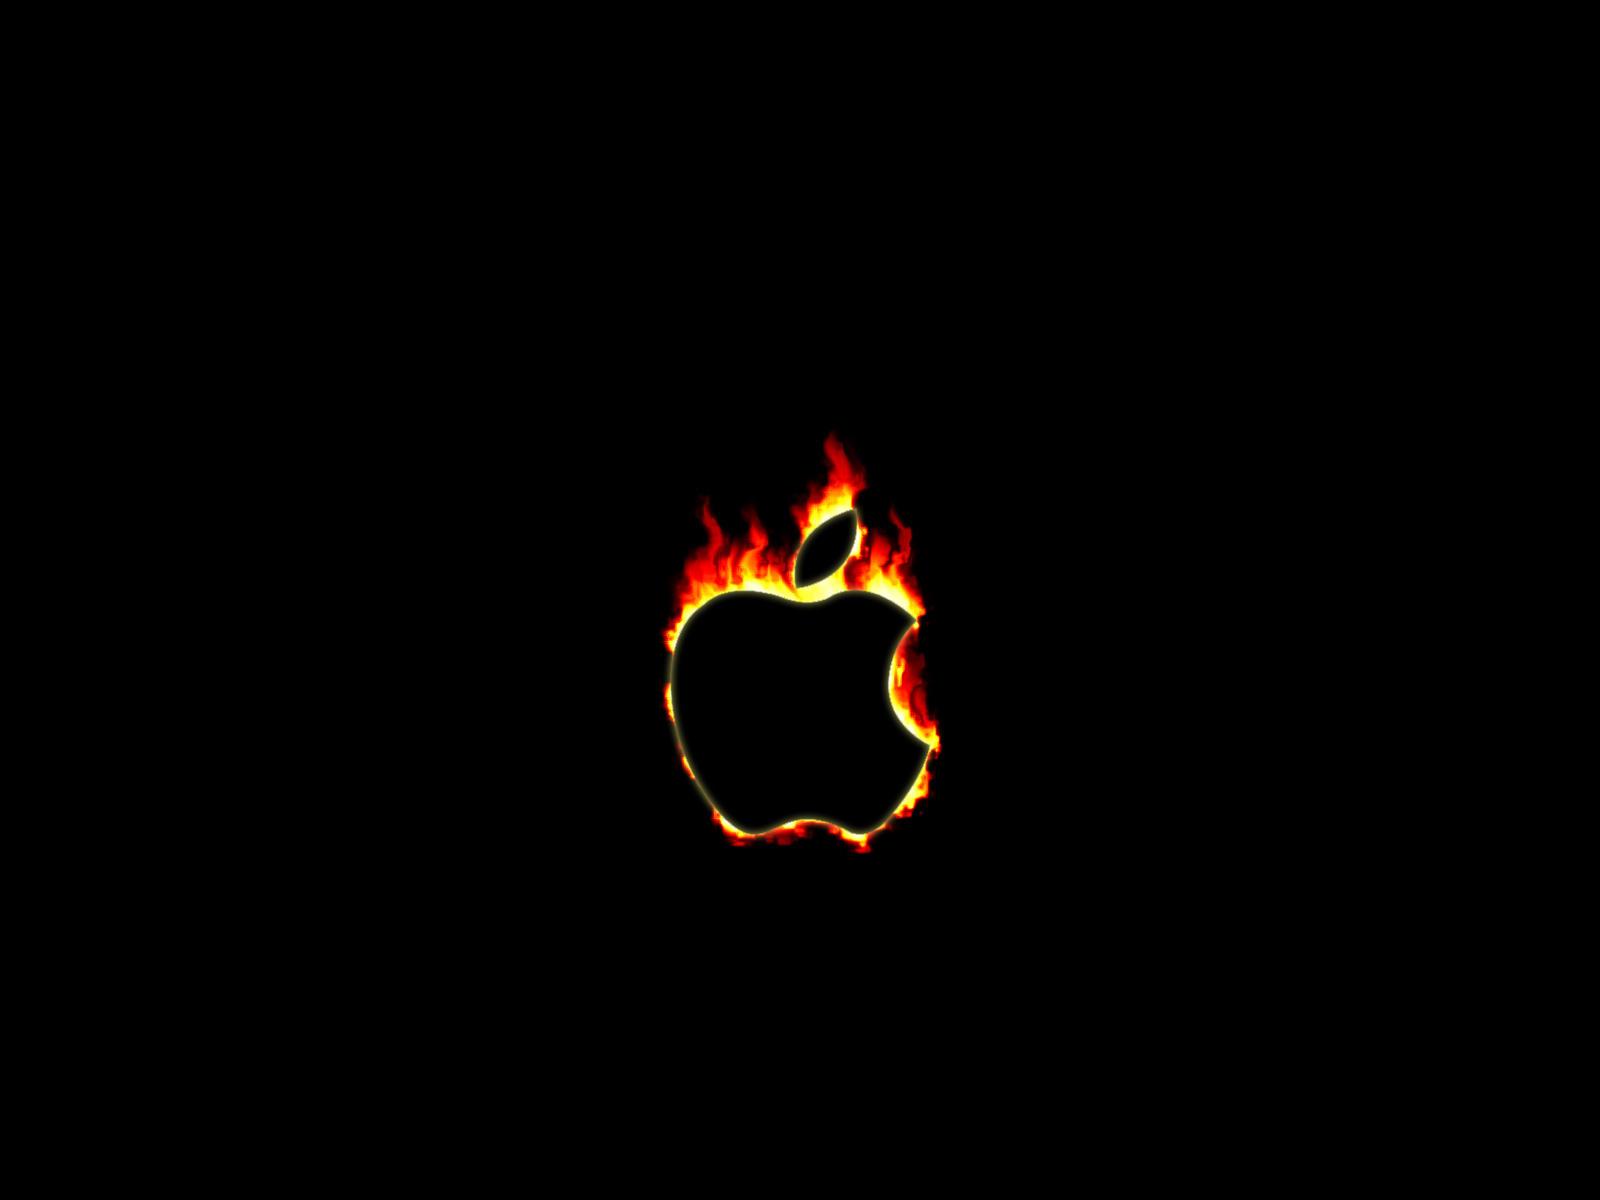 apple fire by signal2noise on deviantart